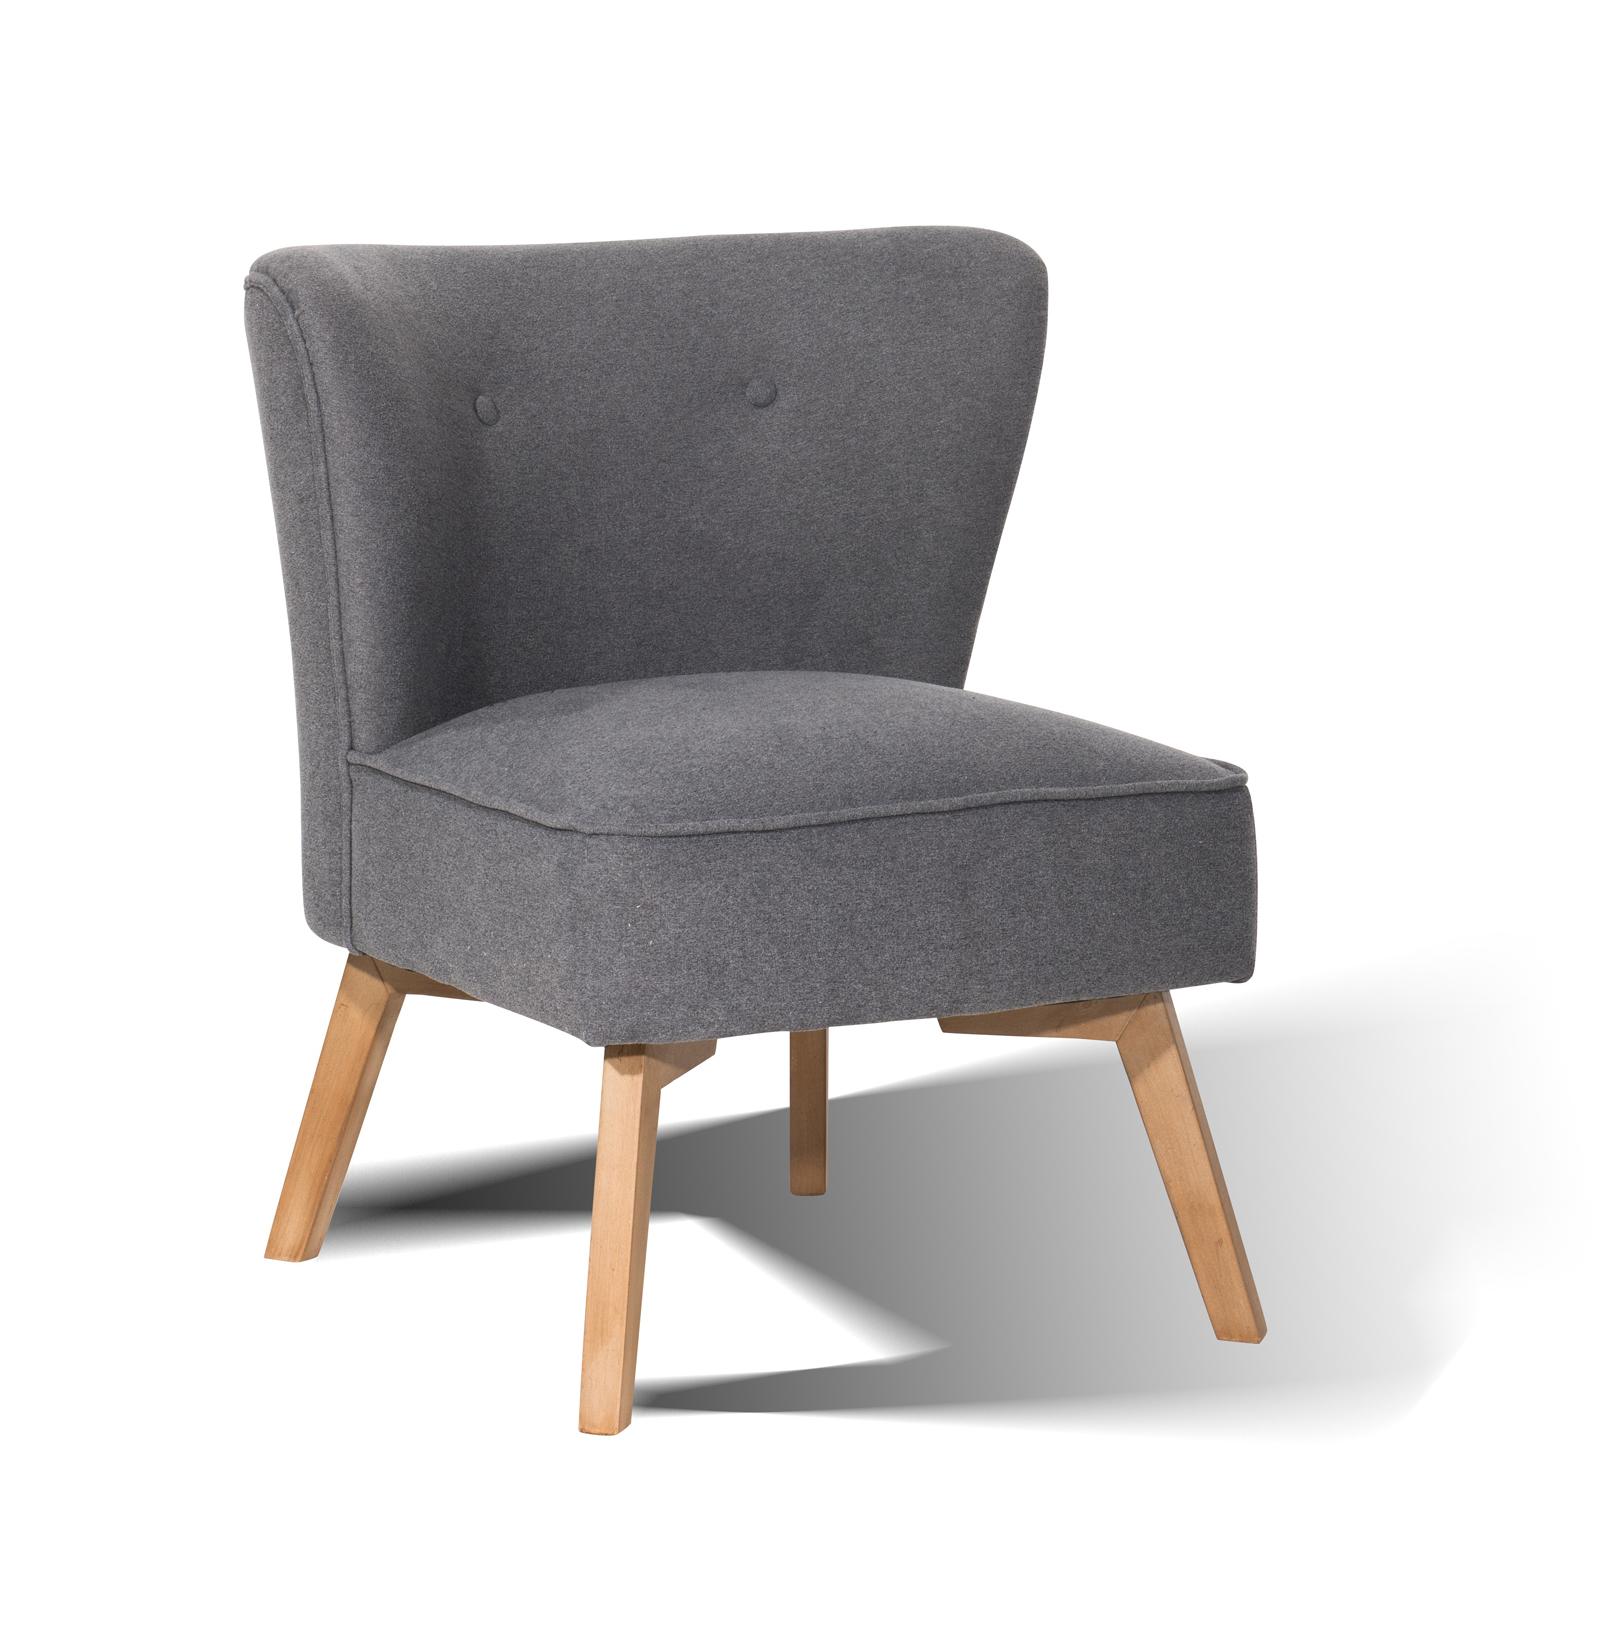 sam design ohrensessel 4736 21 grau hevea sit. Black Bedroom Furniture Sets. Home Design Ideas